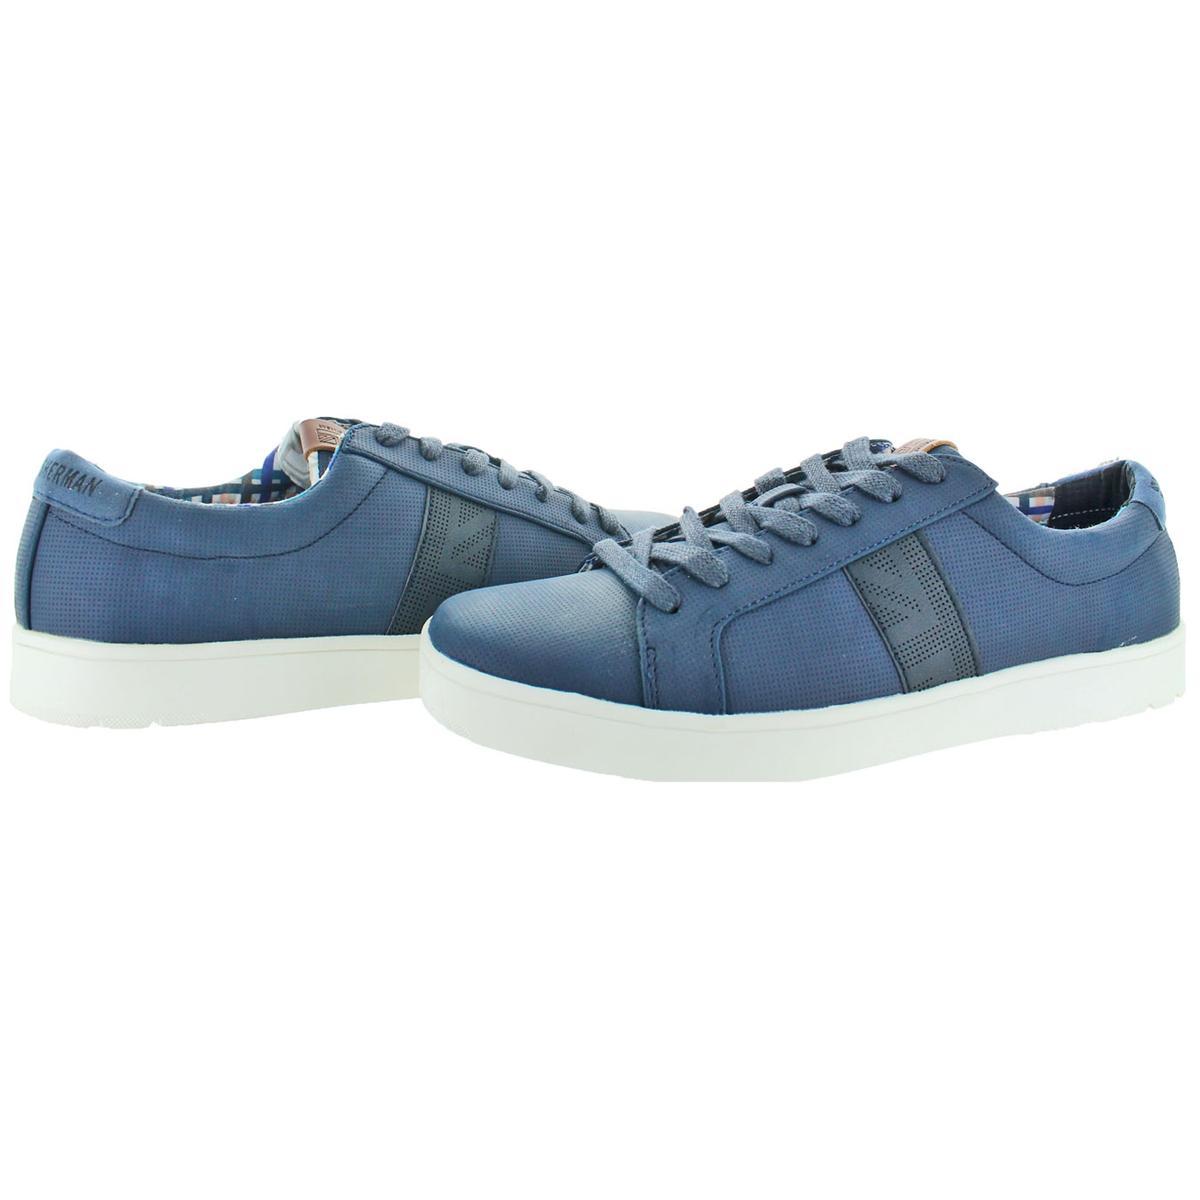 Ben-Sherman-Ashton-Men-039-s-Fashion-Court-Sneakers-Shoes thumbnail 5